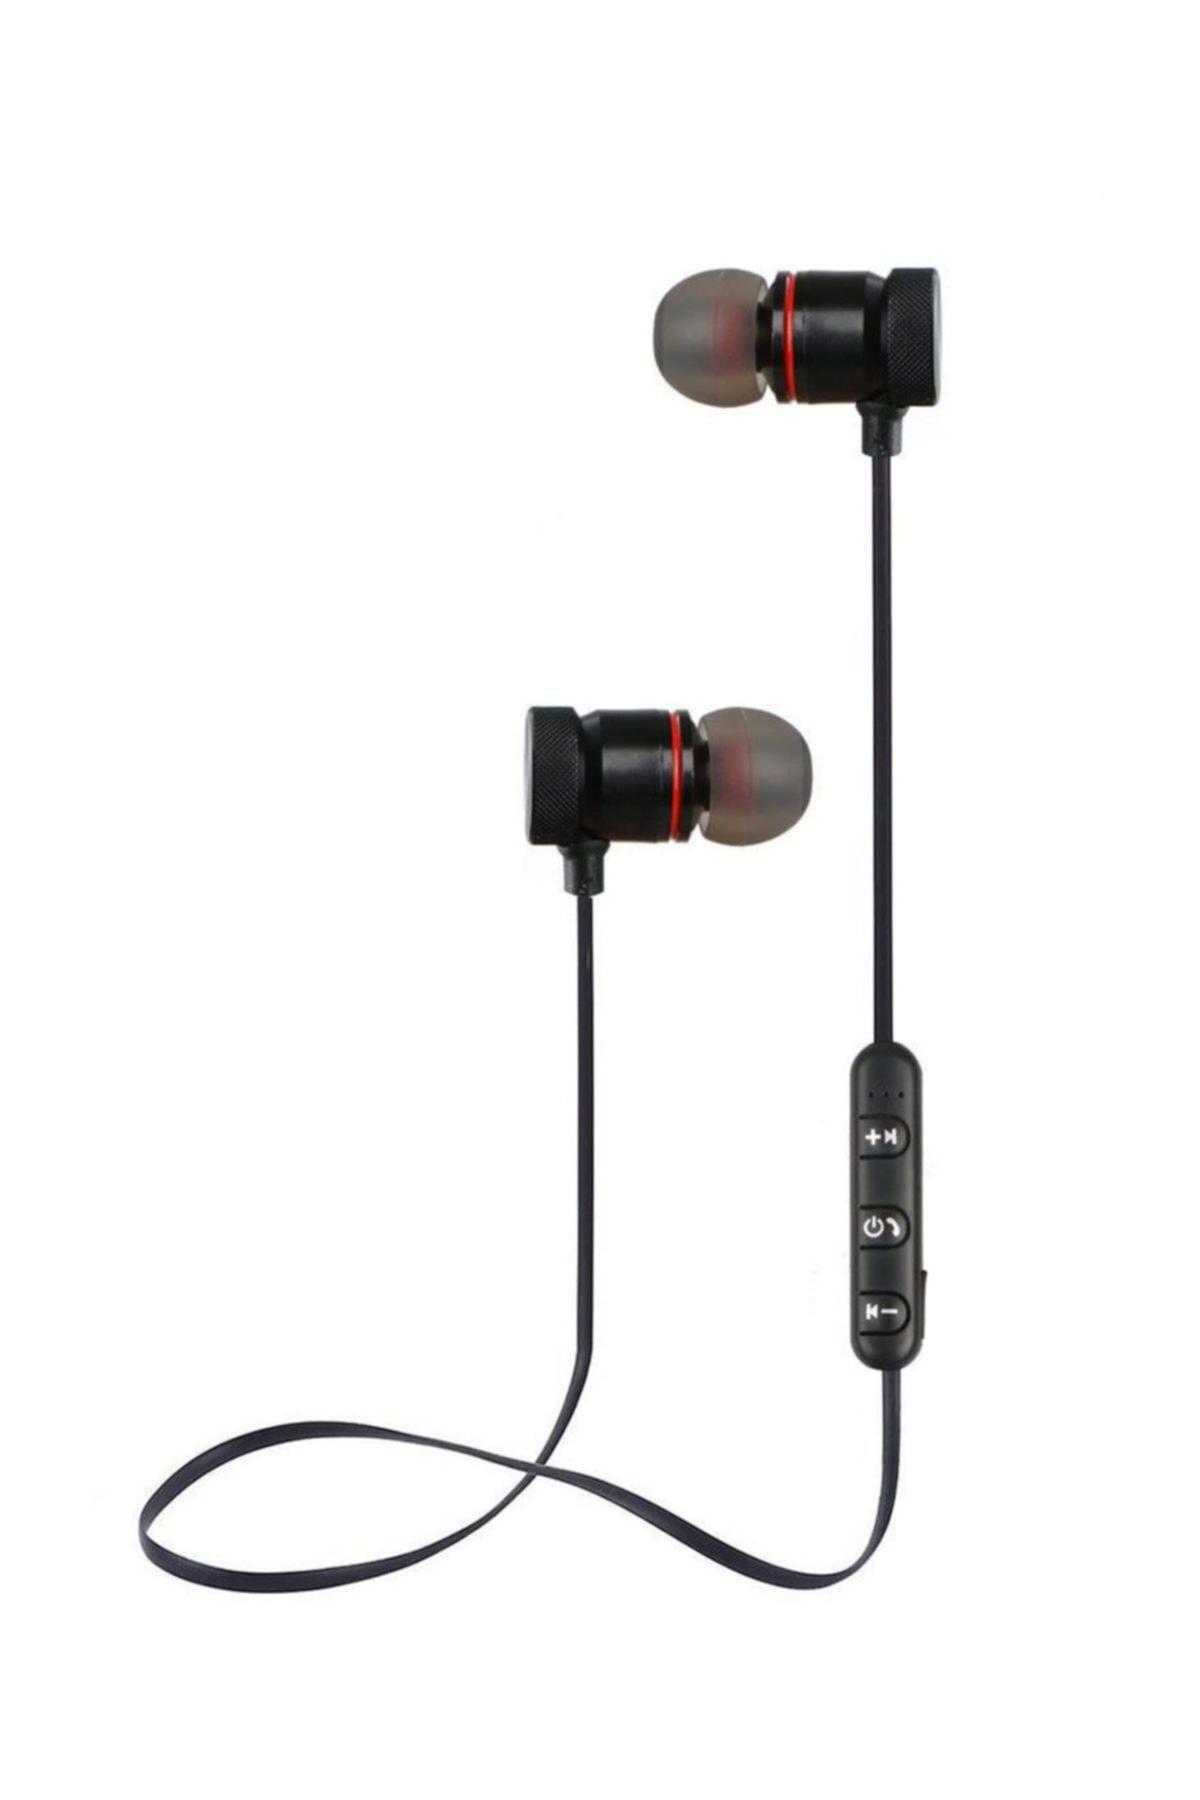 TP Pro Sport Kablosuz Mıknatıslı Mikrofonlu Bluetooth Kulaklık Siyah 2